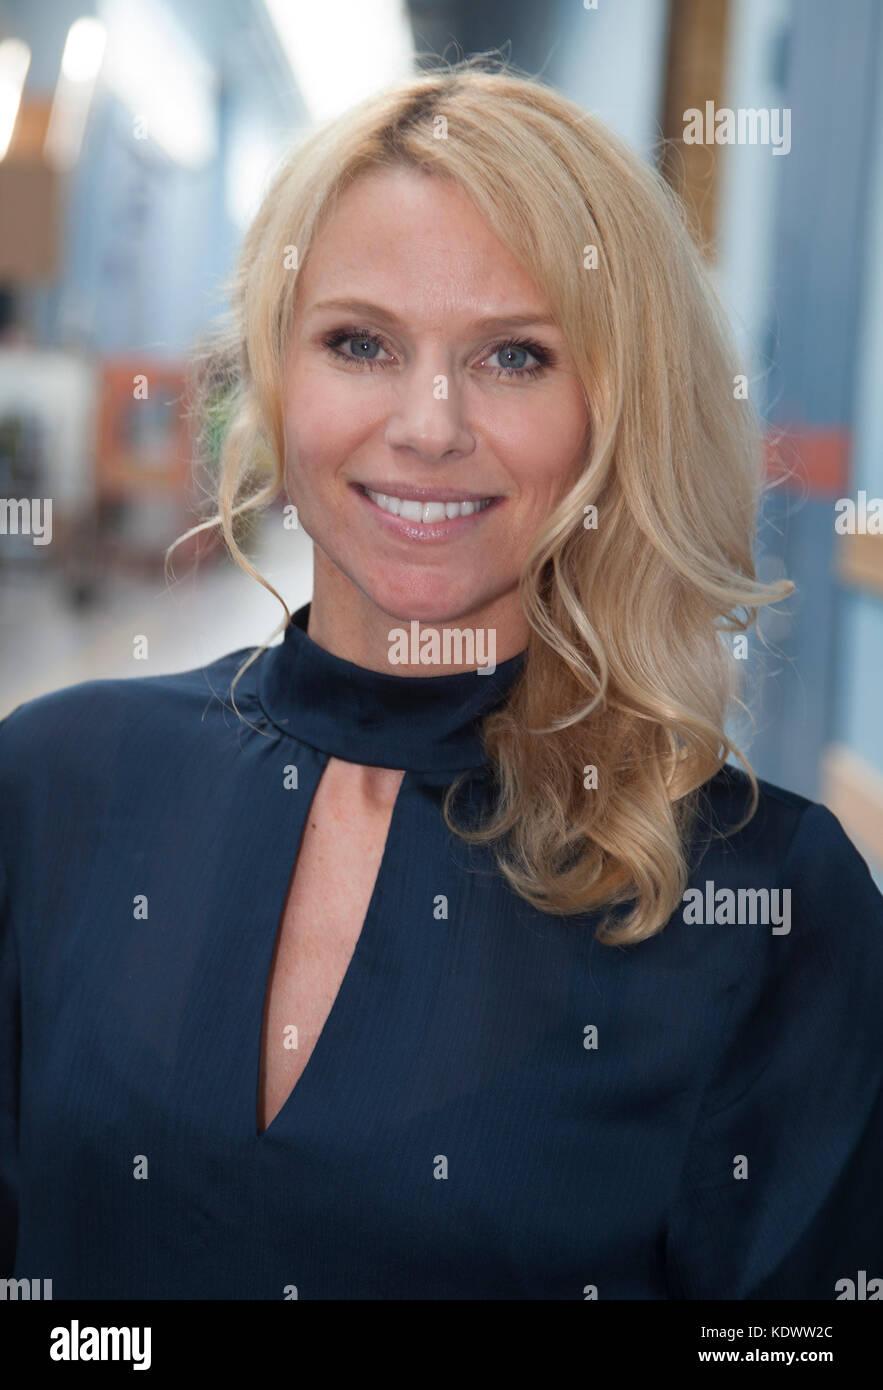 SOFIA RÅGENKLINT Program presenter inSwedish Television  SVT 2017 - Stock Image